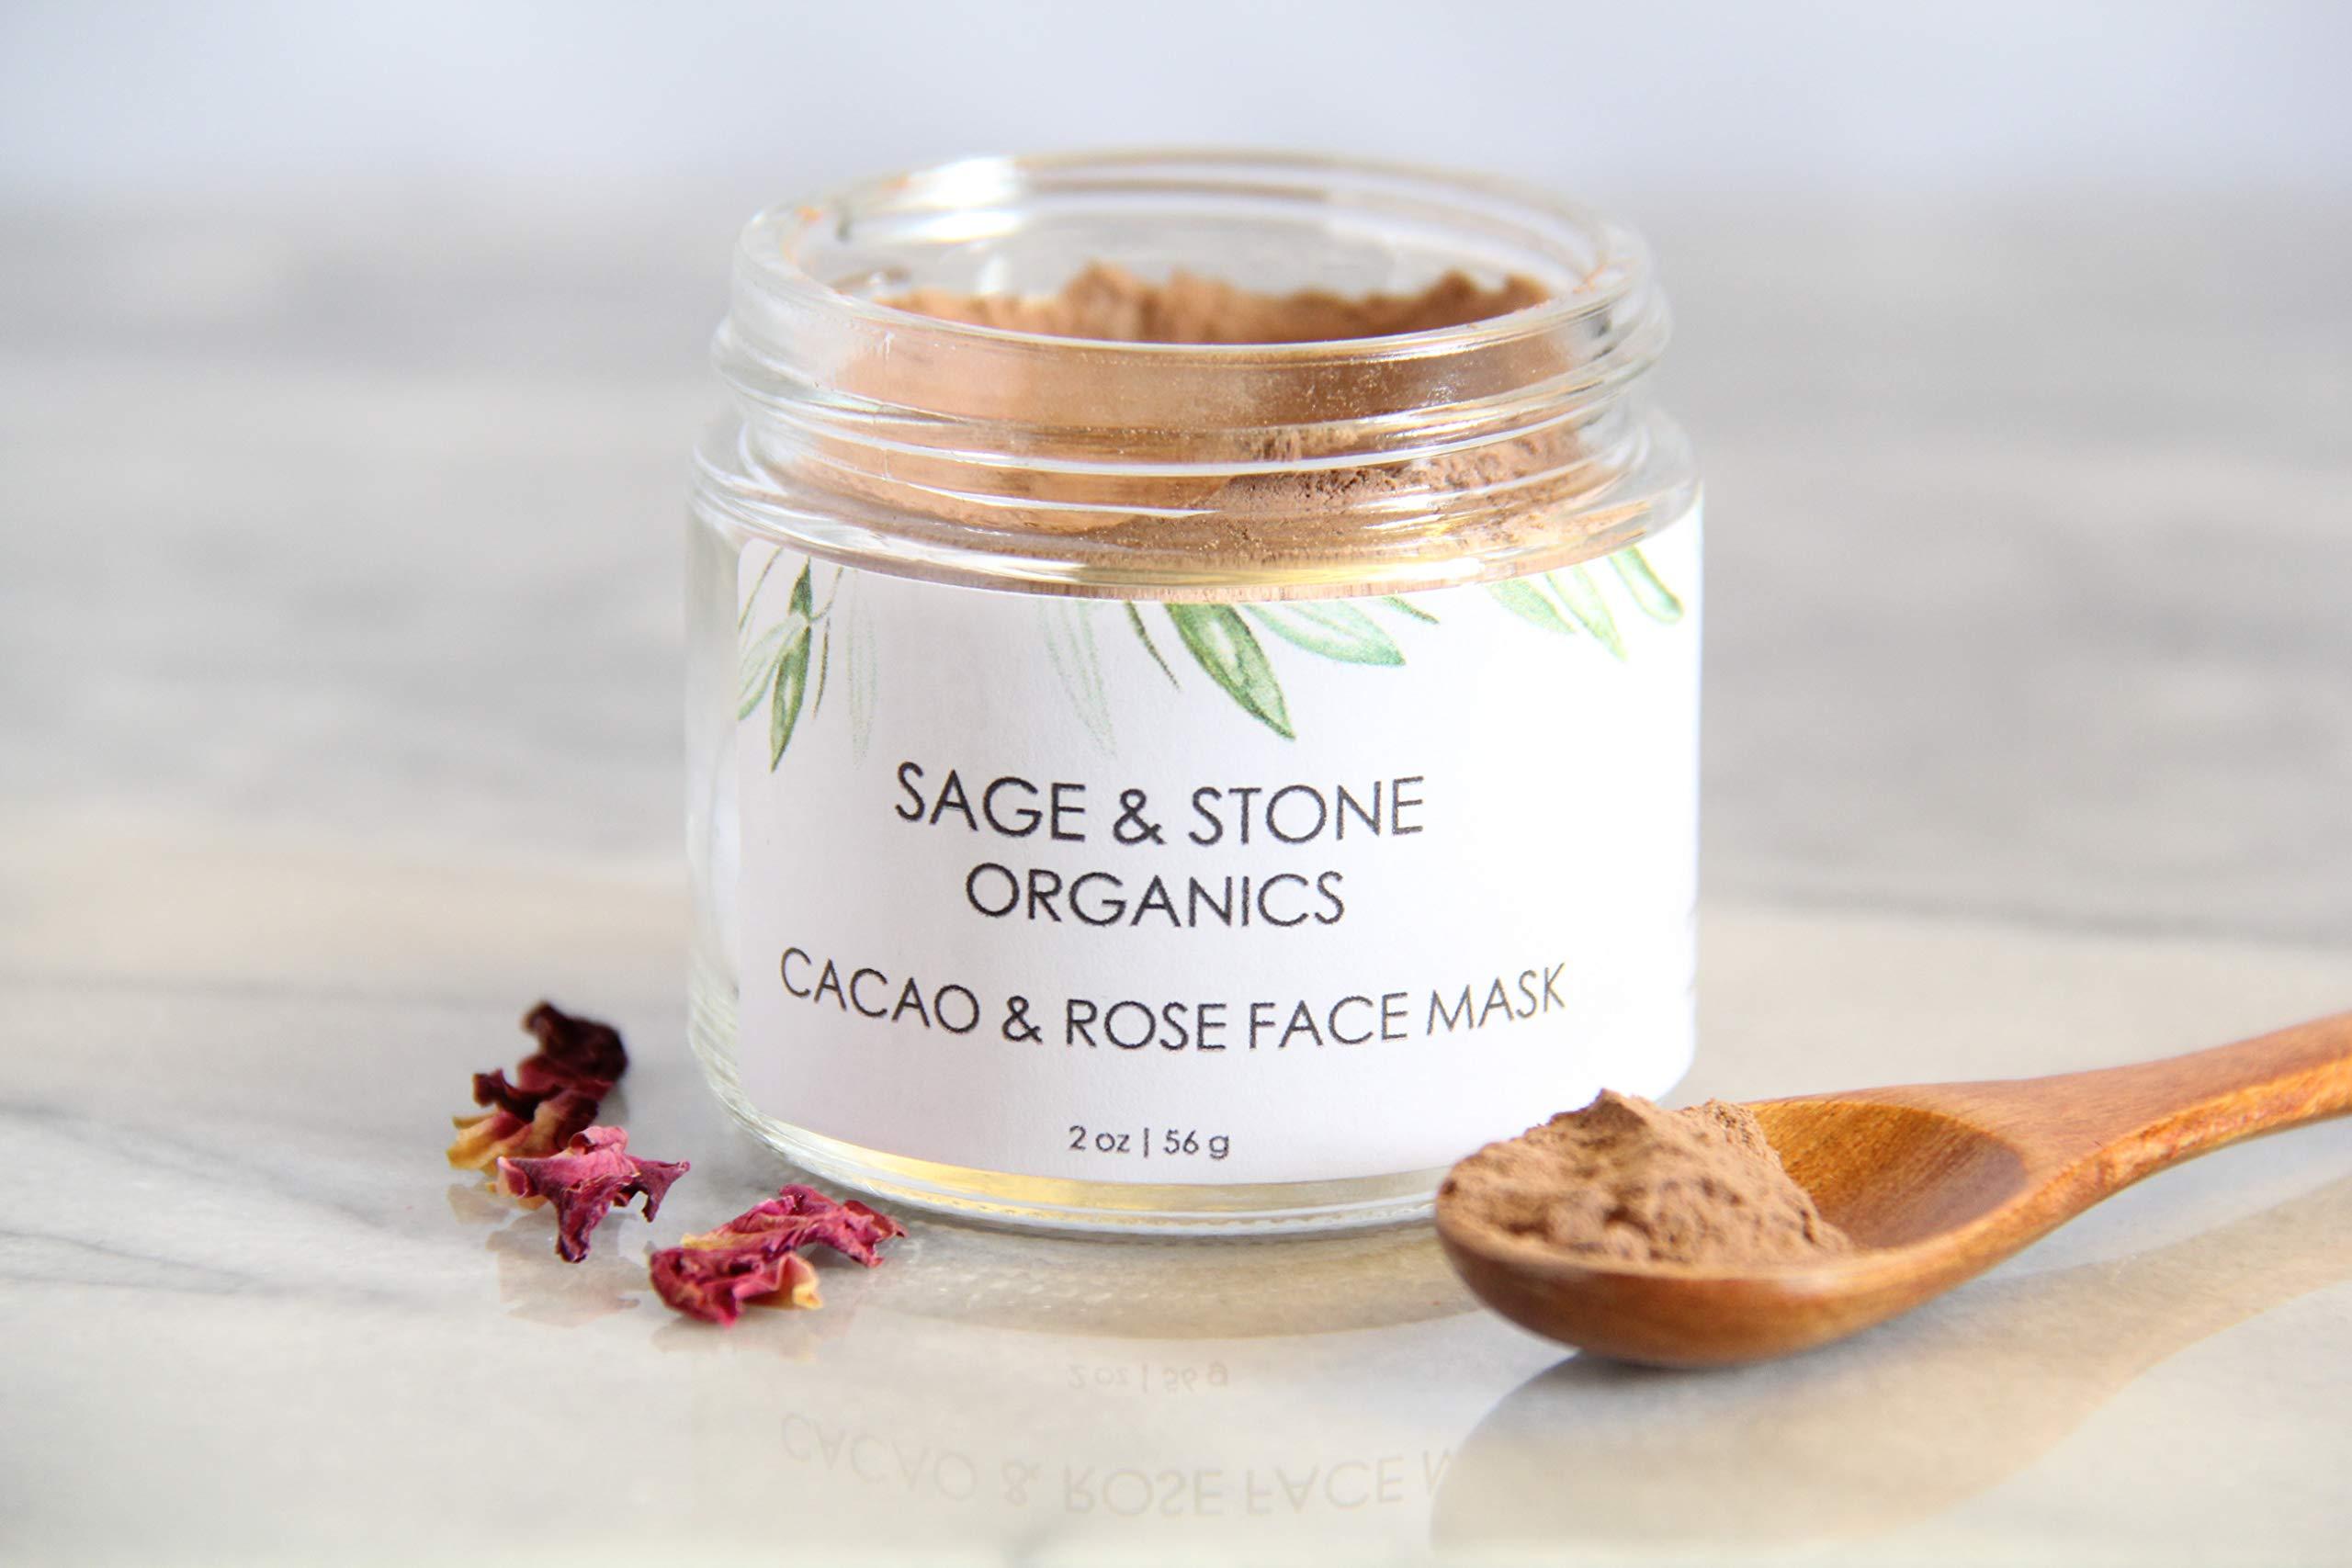 Cacao & Rose Face Mask, Organic Face Mask, All Natural Face Mask, Cruelty Free Face Mask, Face Mask for Aging Skin, Anti Aging Face Mask, Antioxidant Face Mask, Organic Skin Care, 2 Ounces